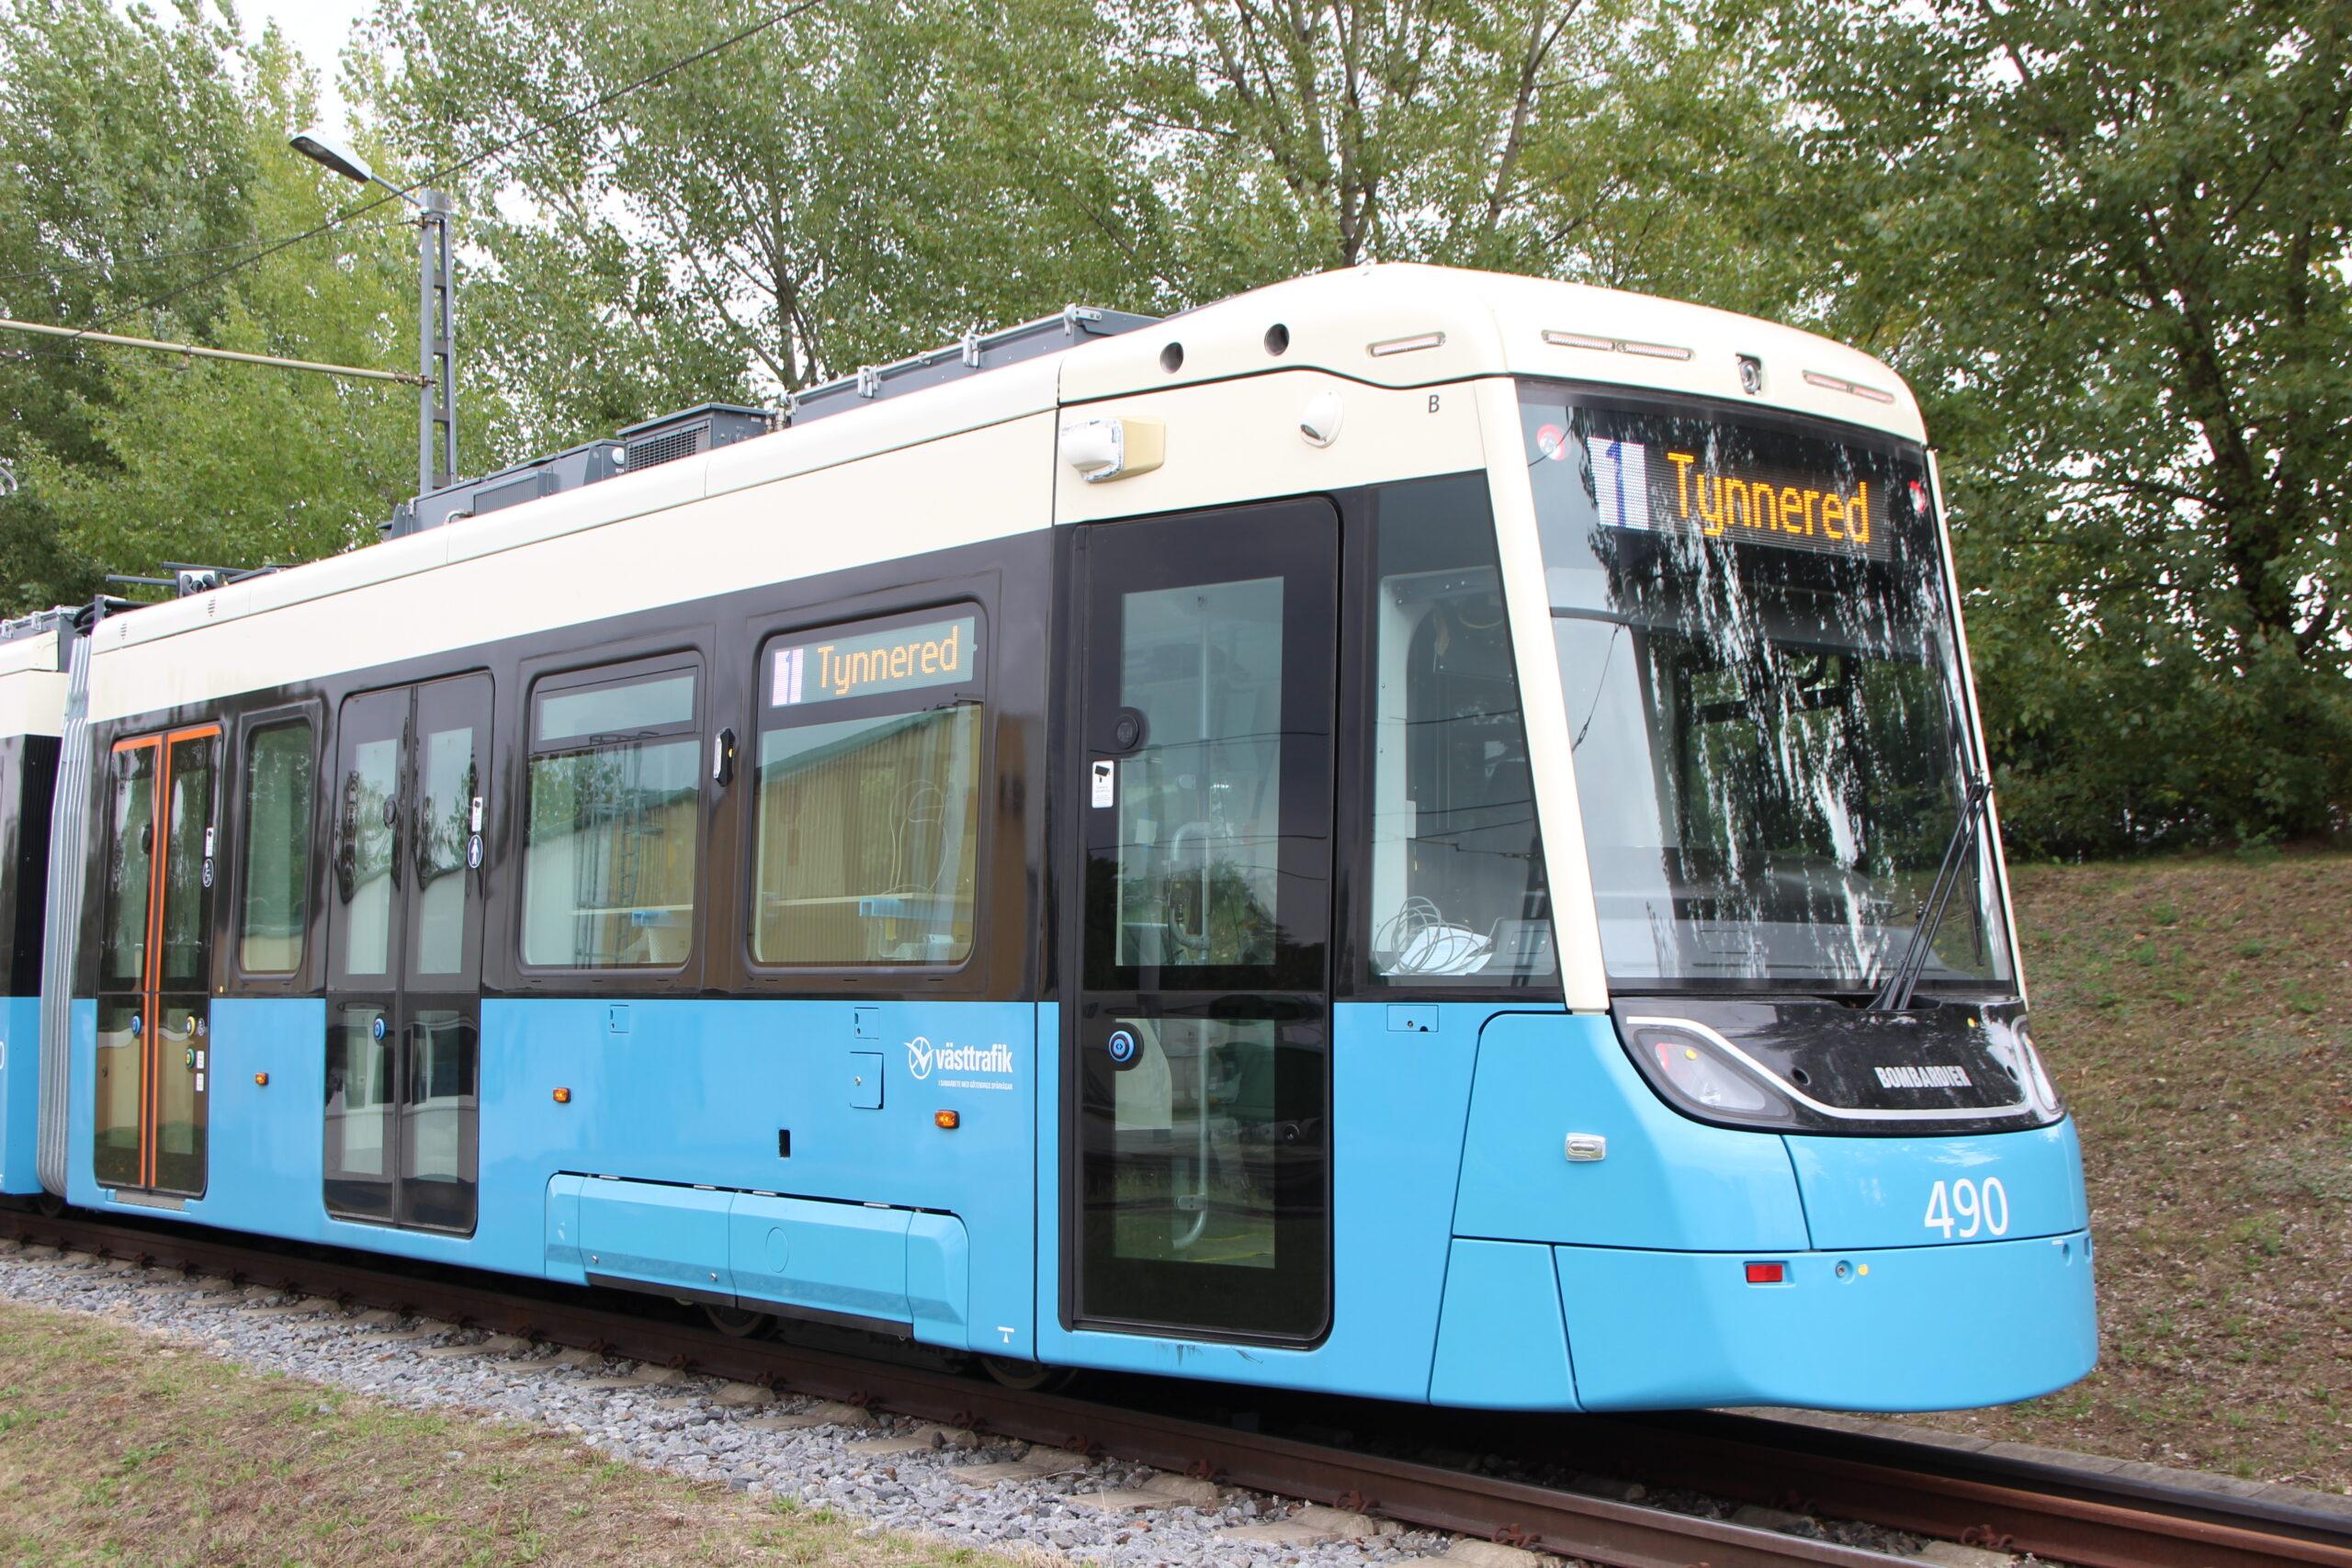 Bombardier M33 FLEXITY tram for Gothenburg